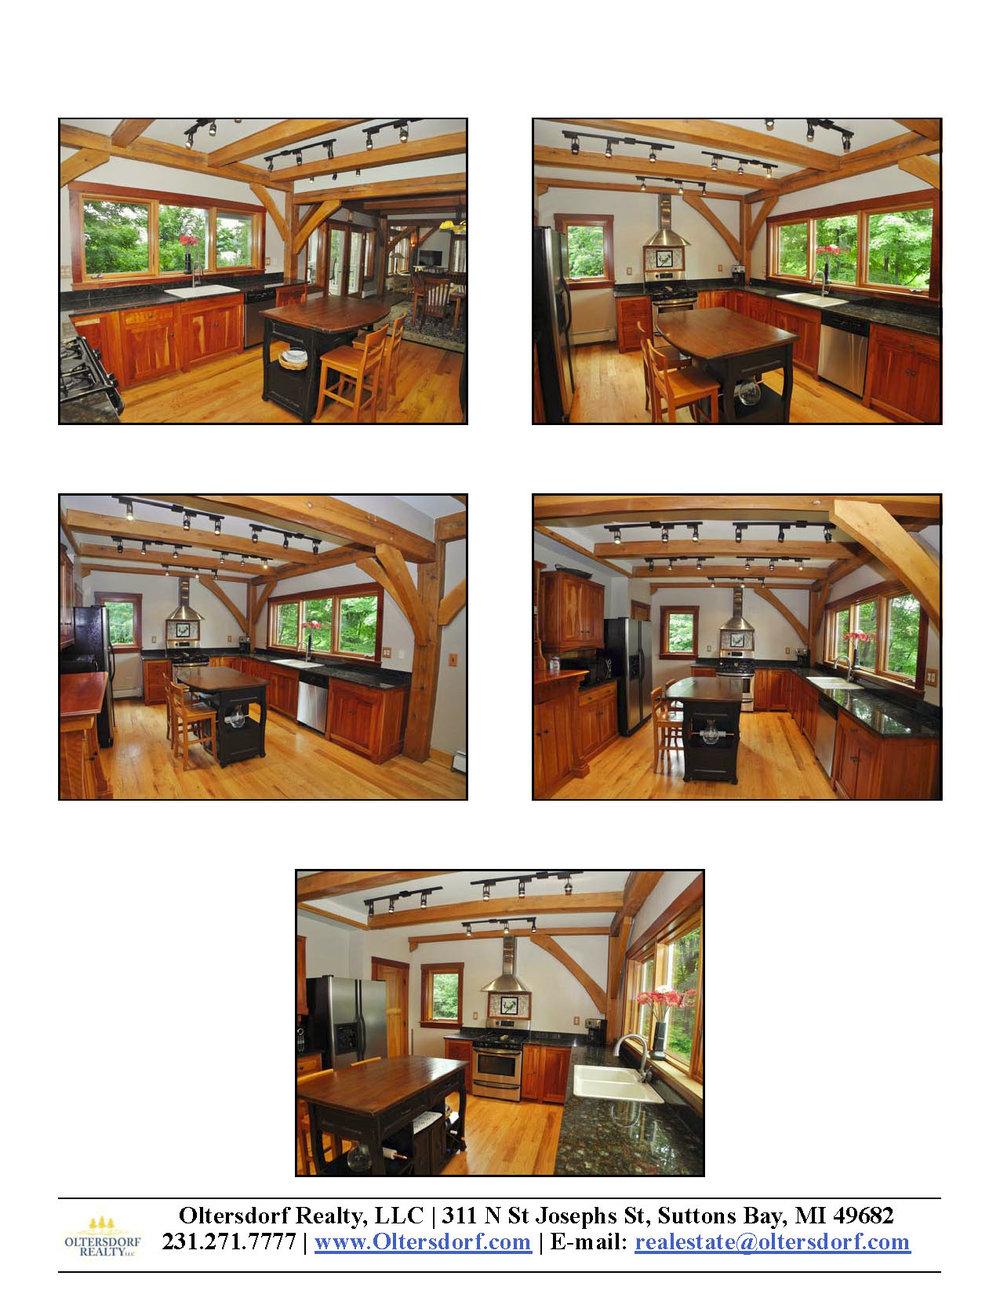 5500 E Hidden Beech, Cedar, MI - For sale by Oltersdorf Realty LLC - Marketing Packet (6).jpg